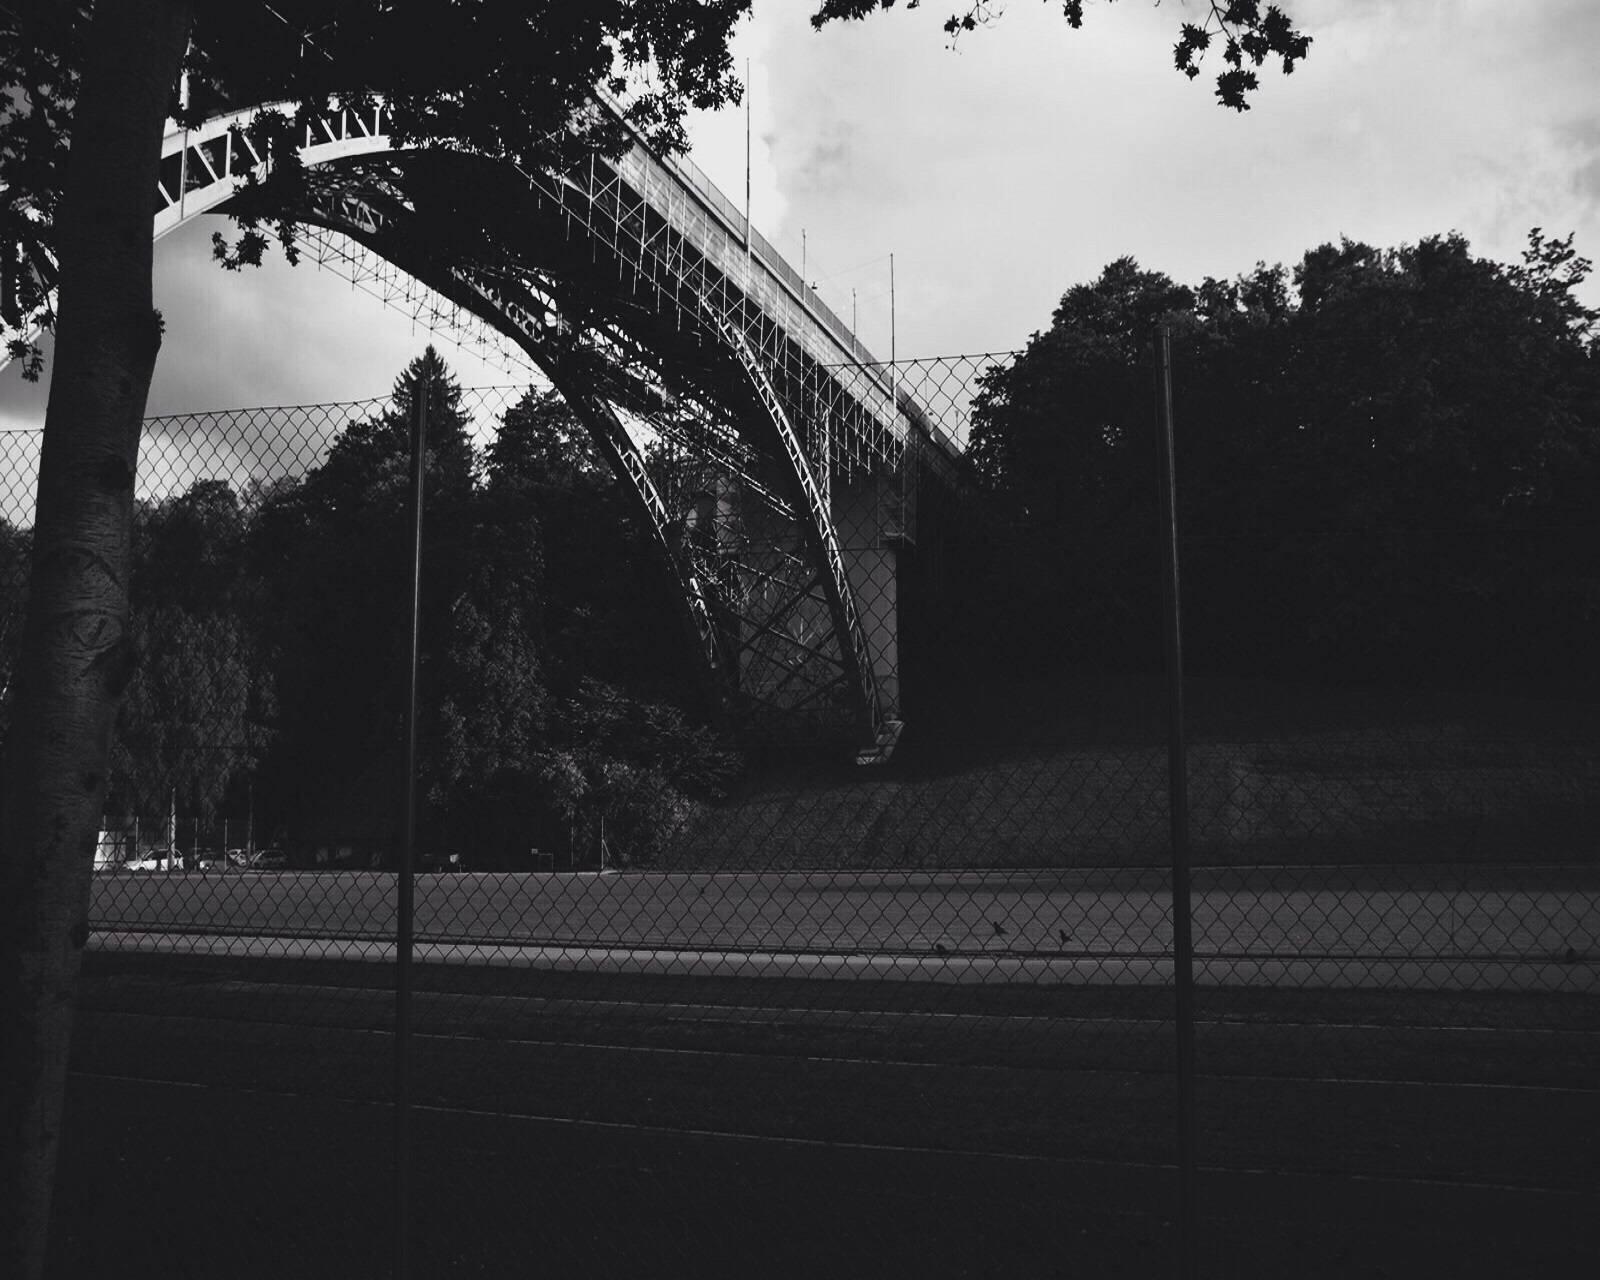 Bridge of train